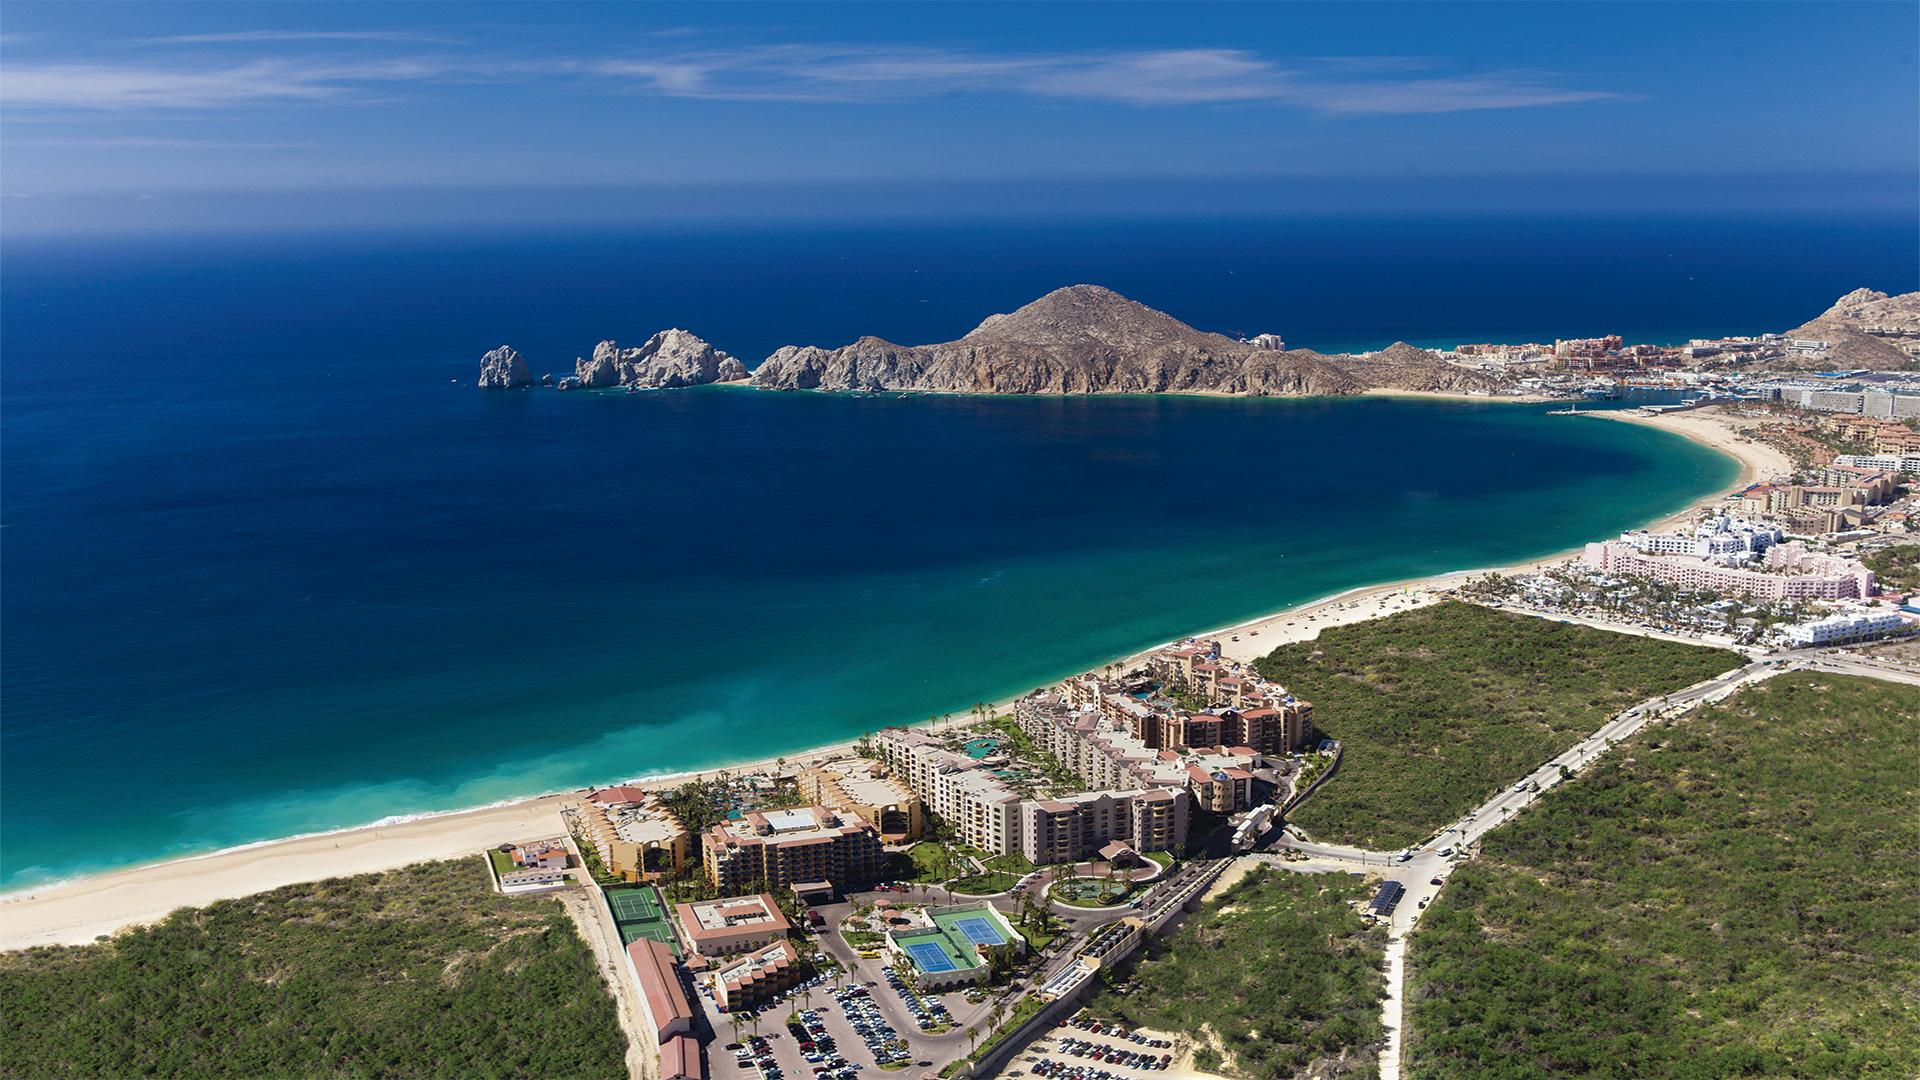 Cabo San Lucas Resort Location